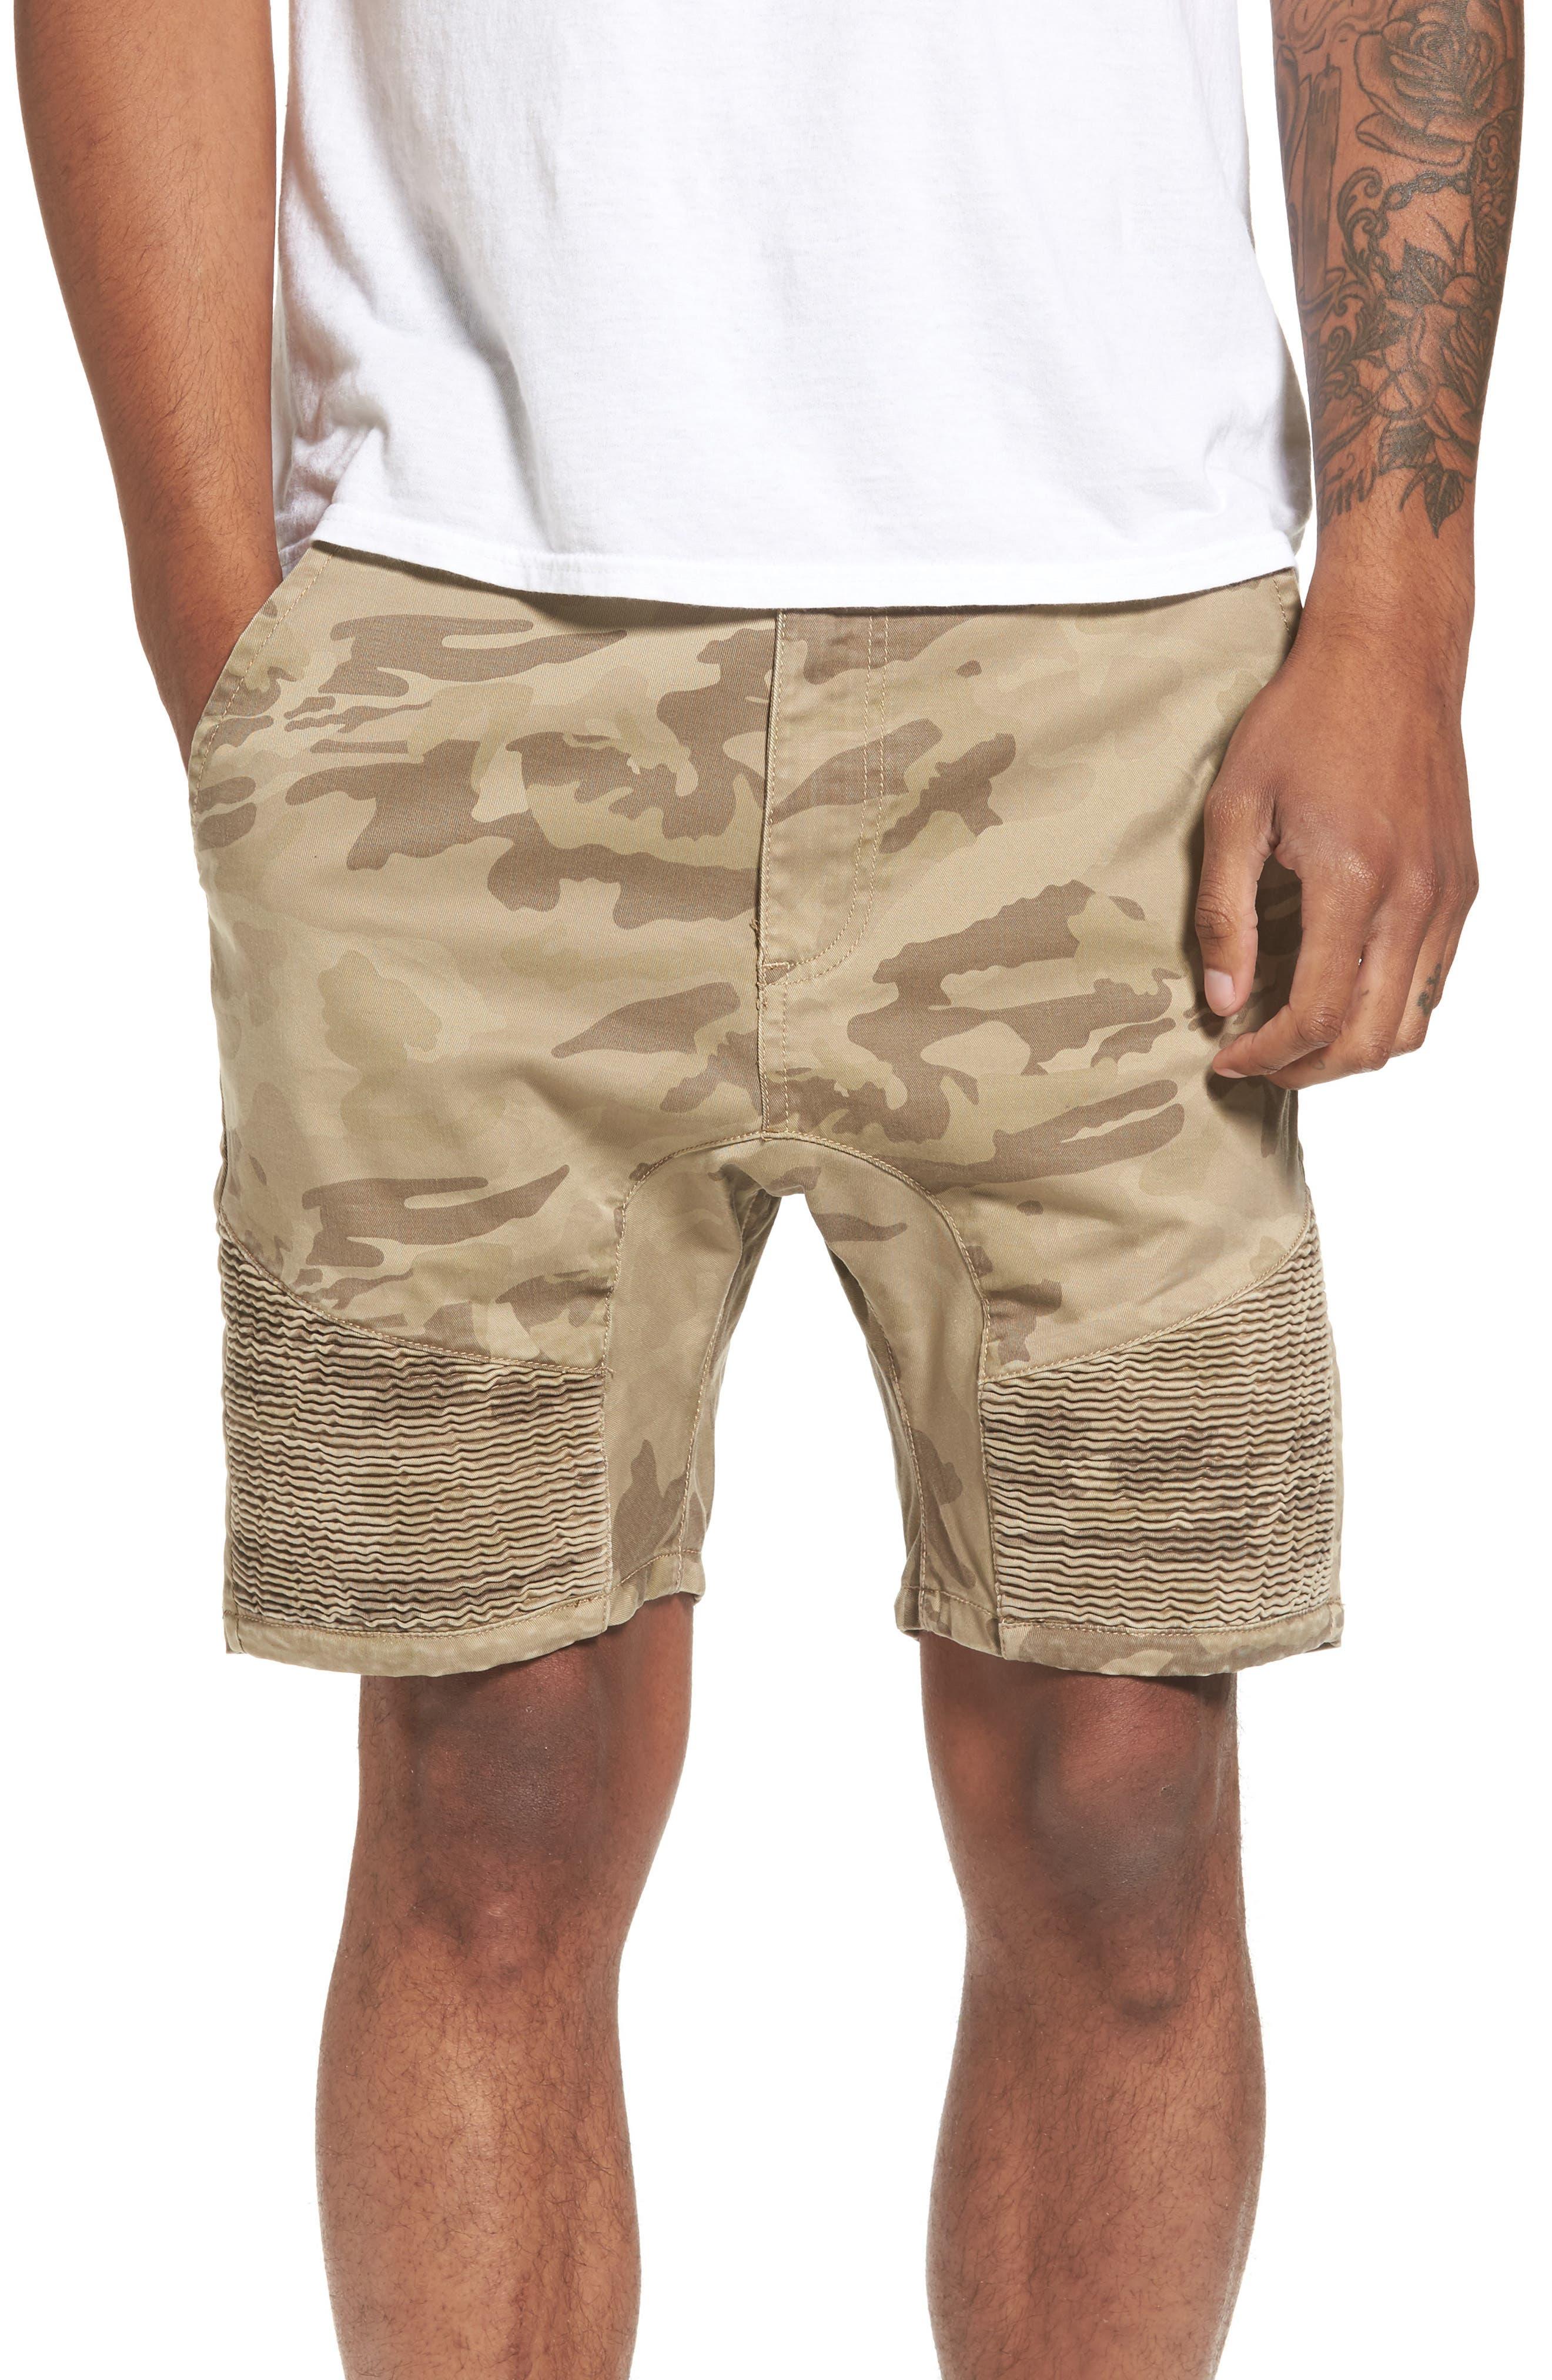 Scope Shorts,                         Main,                         color, Sandstorm Camo